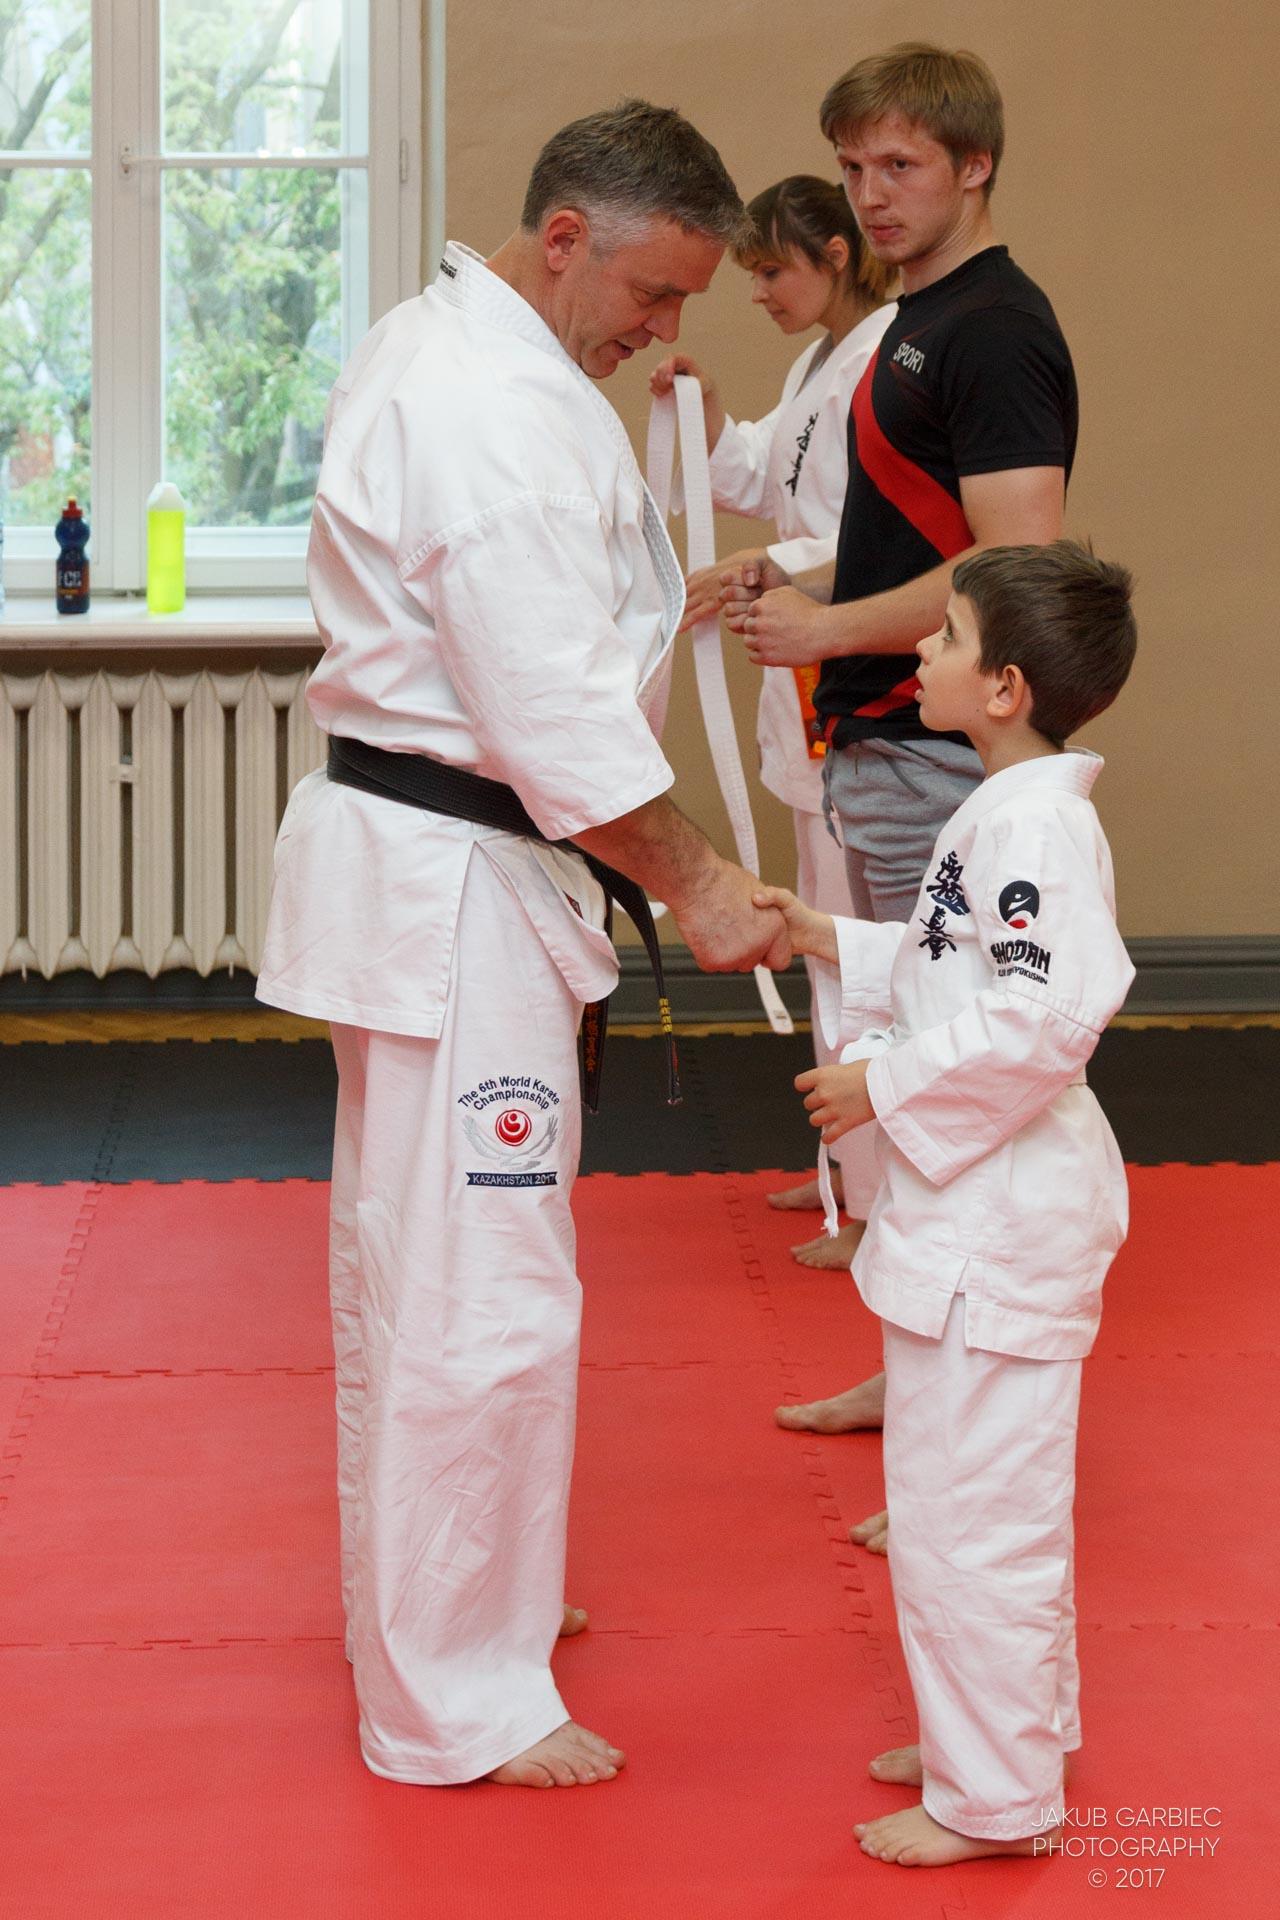 egzamin-karate-mistrz-mariusz-mazur-klub-karate-shodan-2017-06-02-21